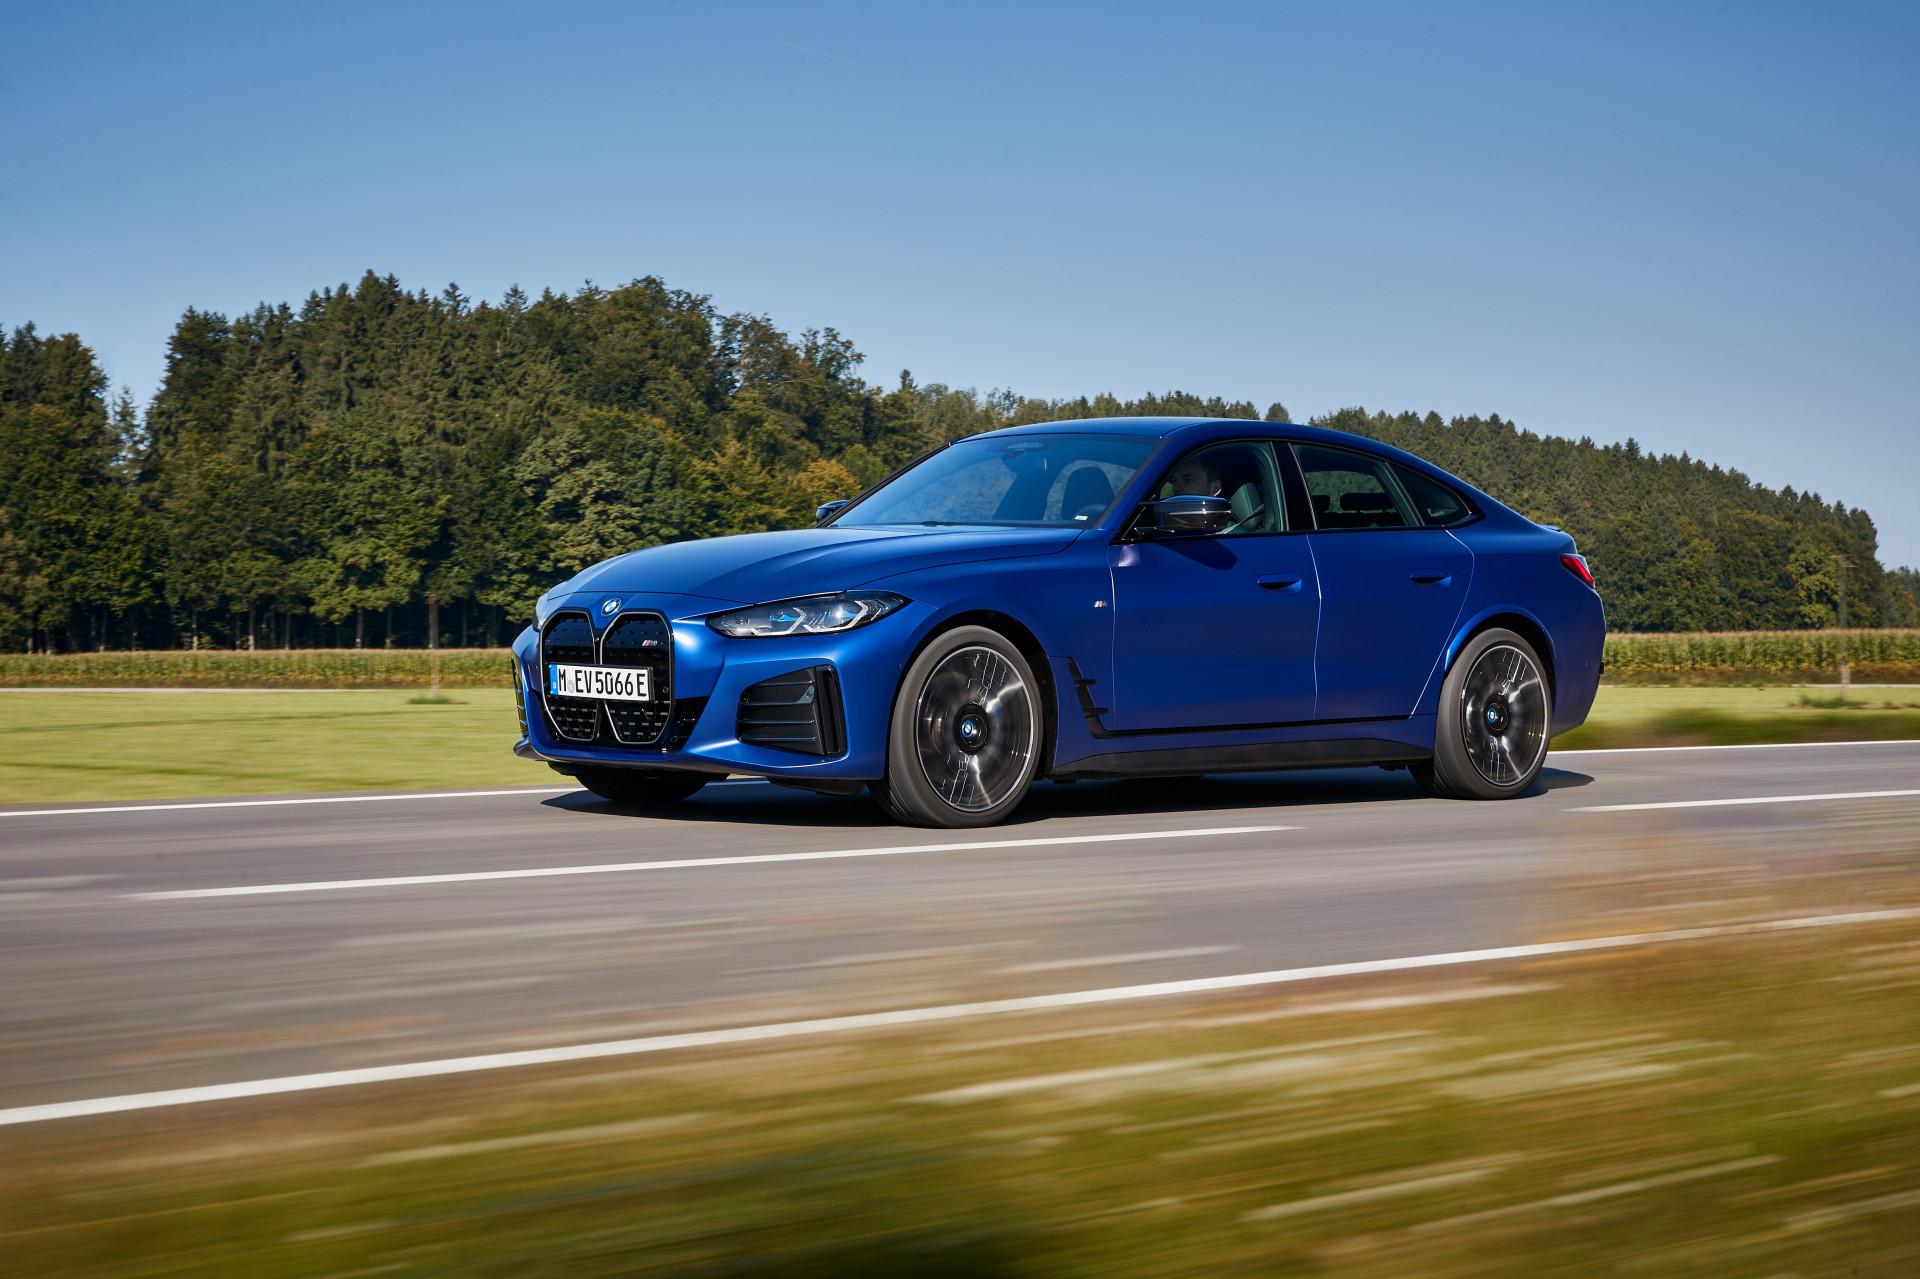 Test 2022 BMW i4 Main Information